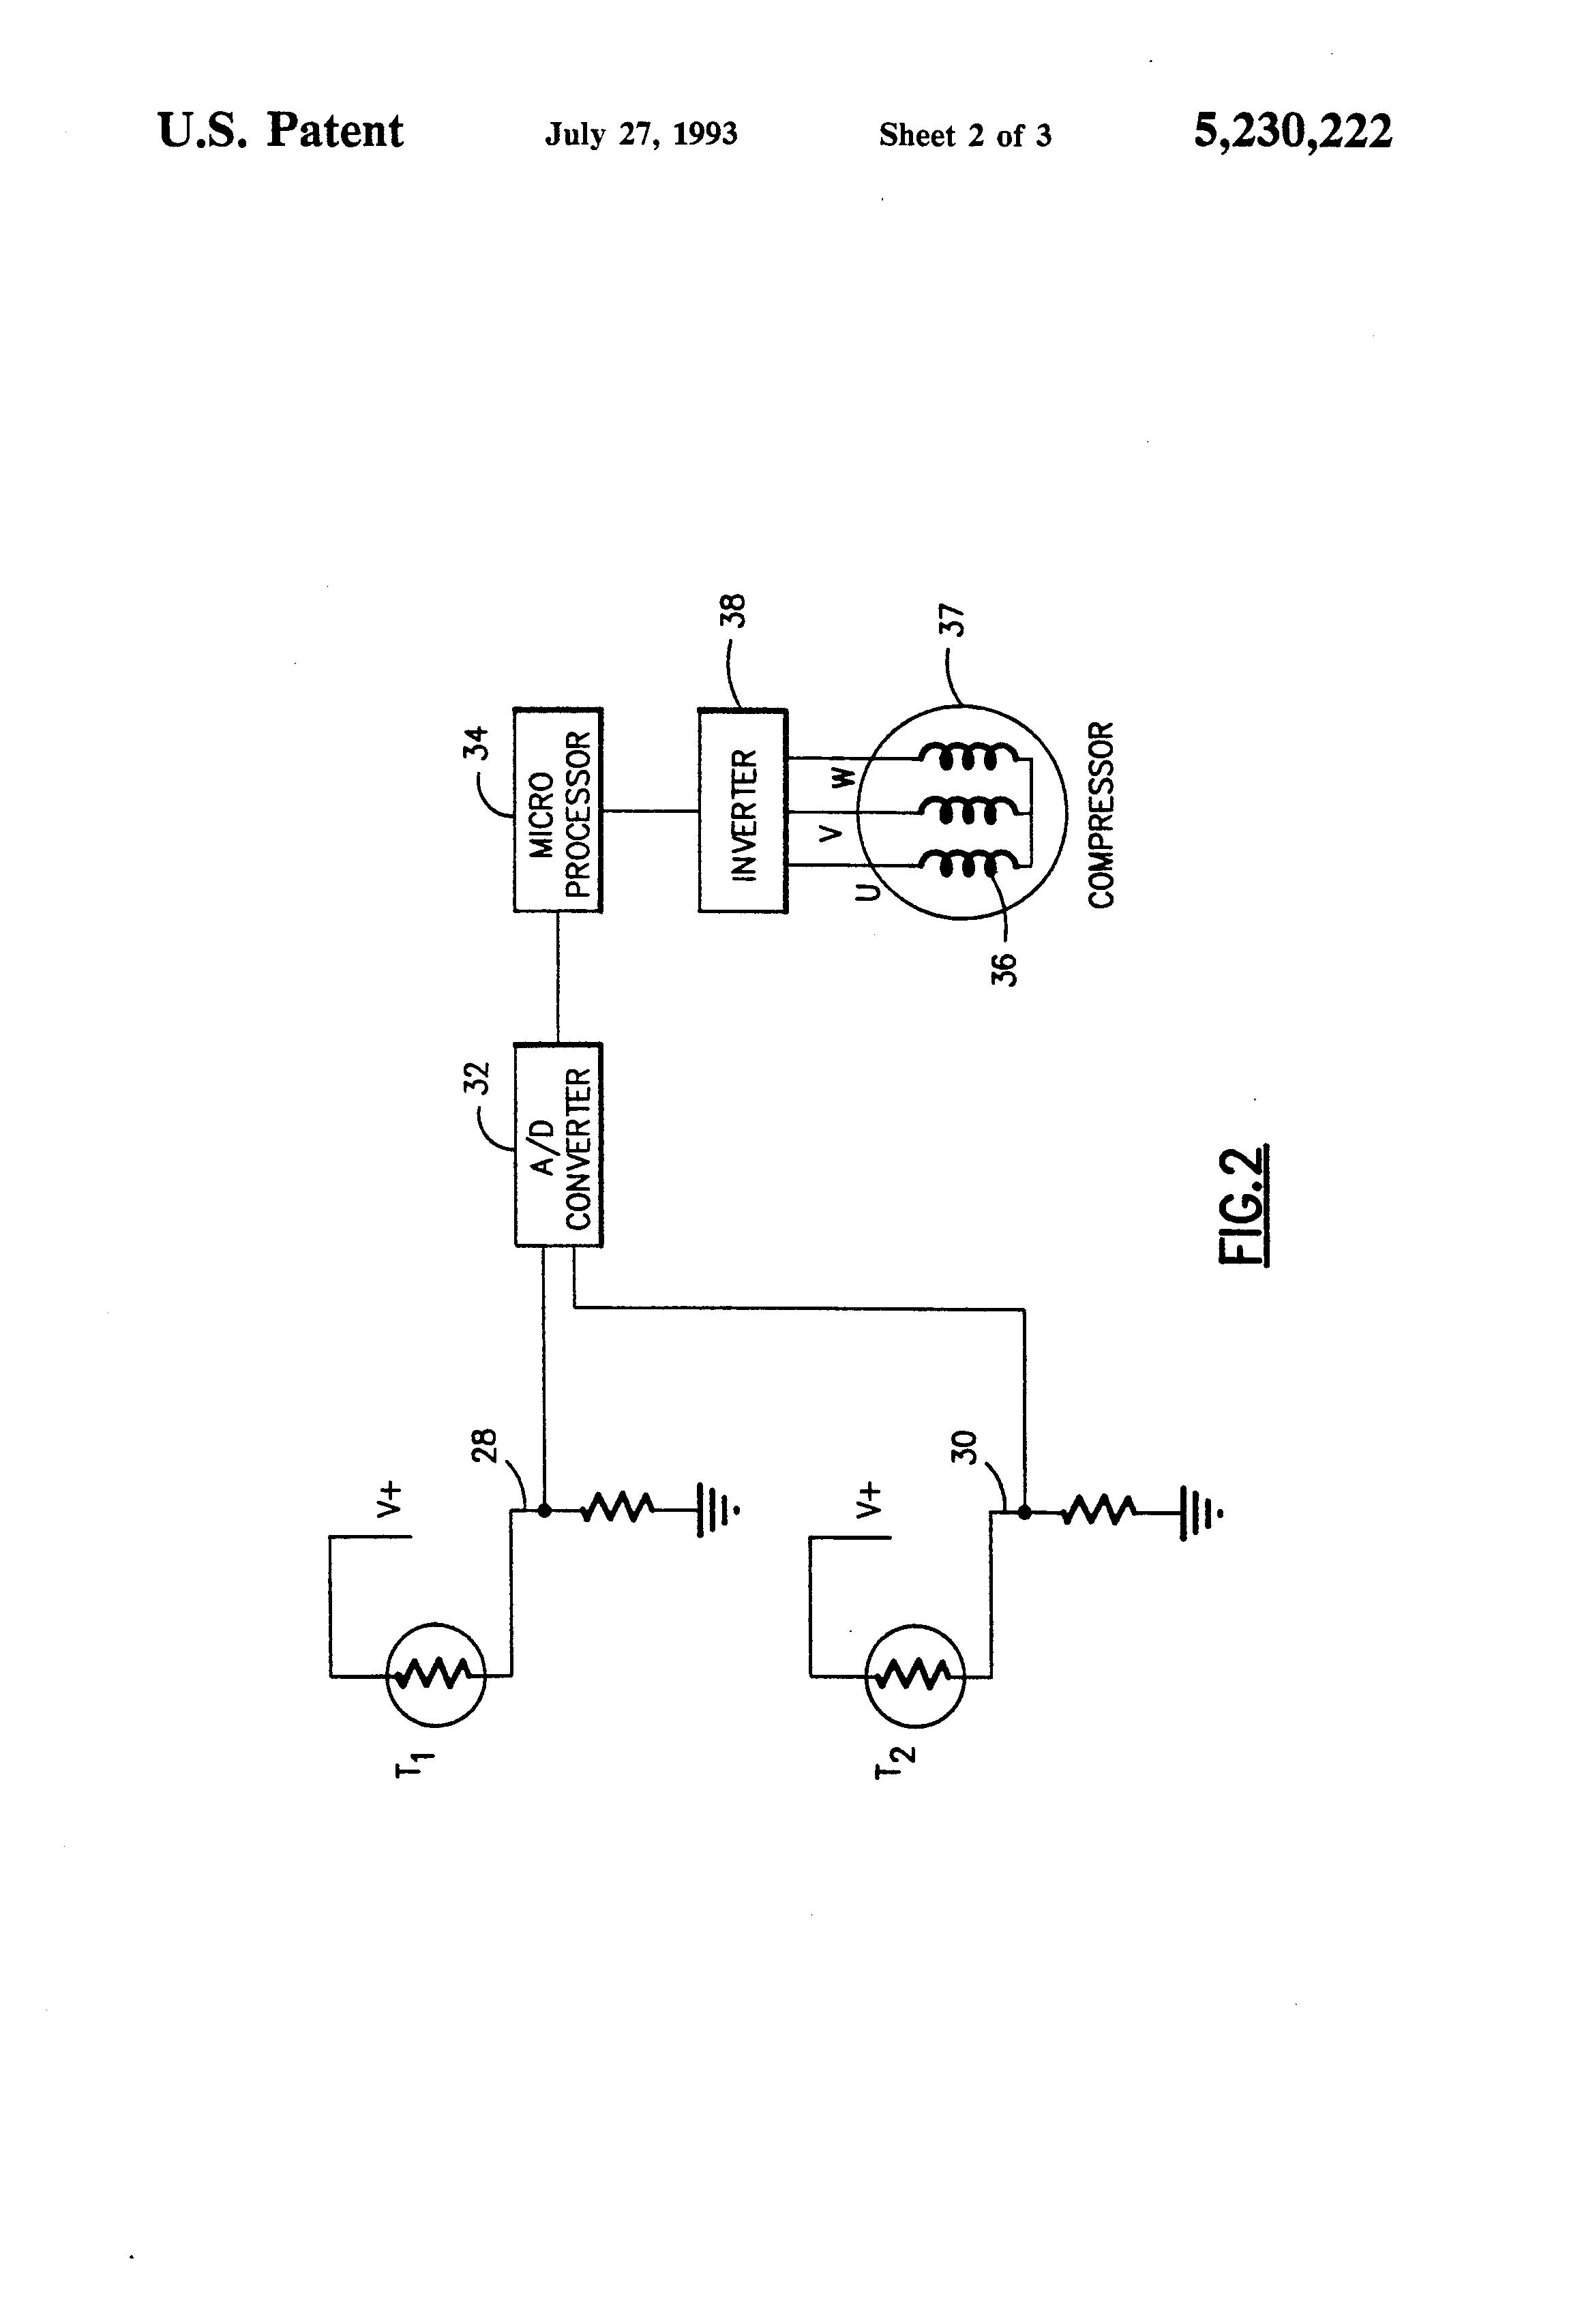 Trane Heat Pump Crankcase Heater Wiring Diagram Trusted Compressor Diagrams Xl1200